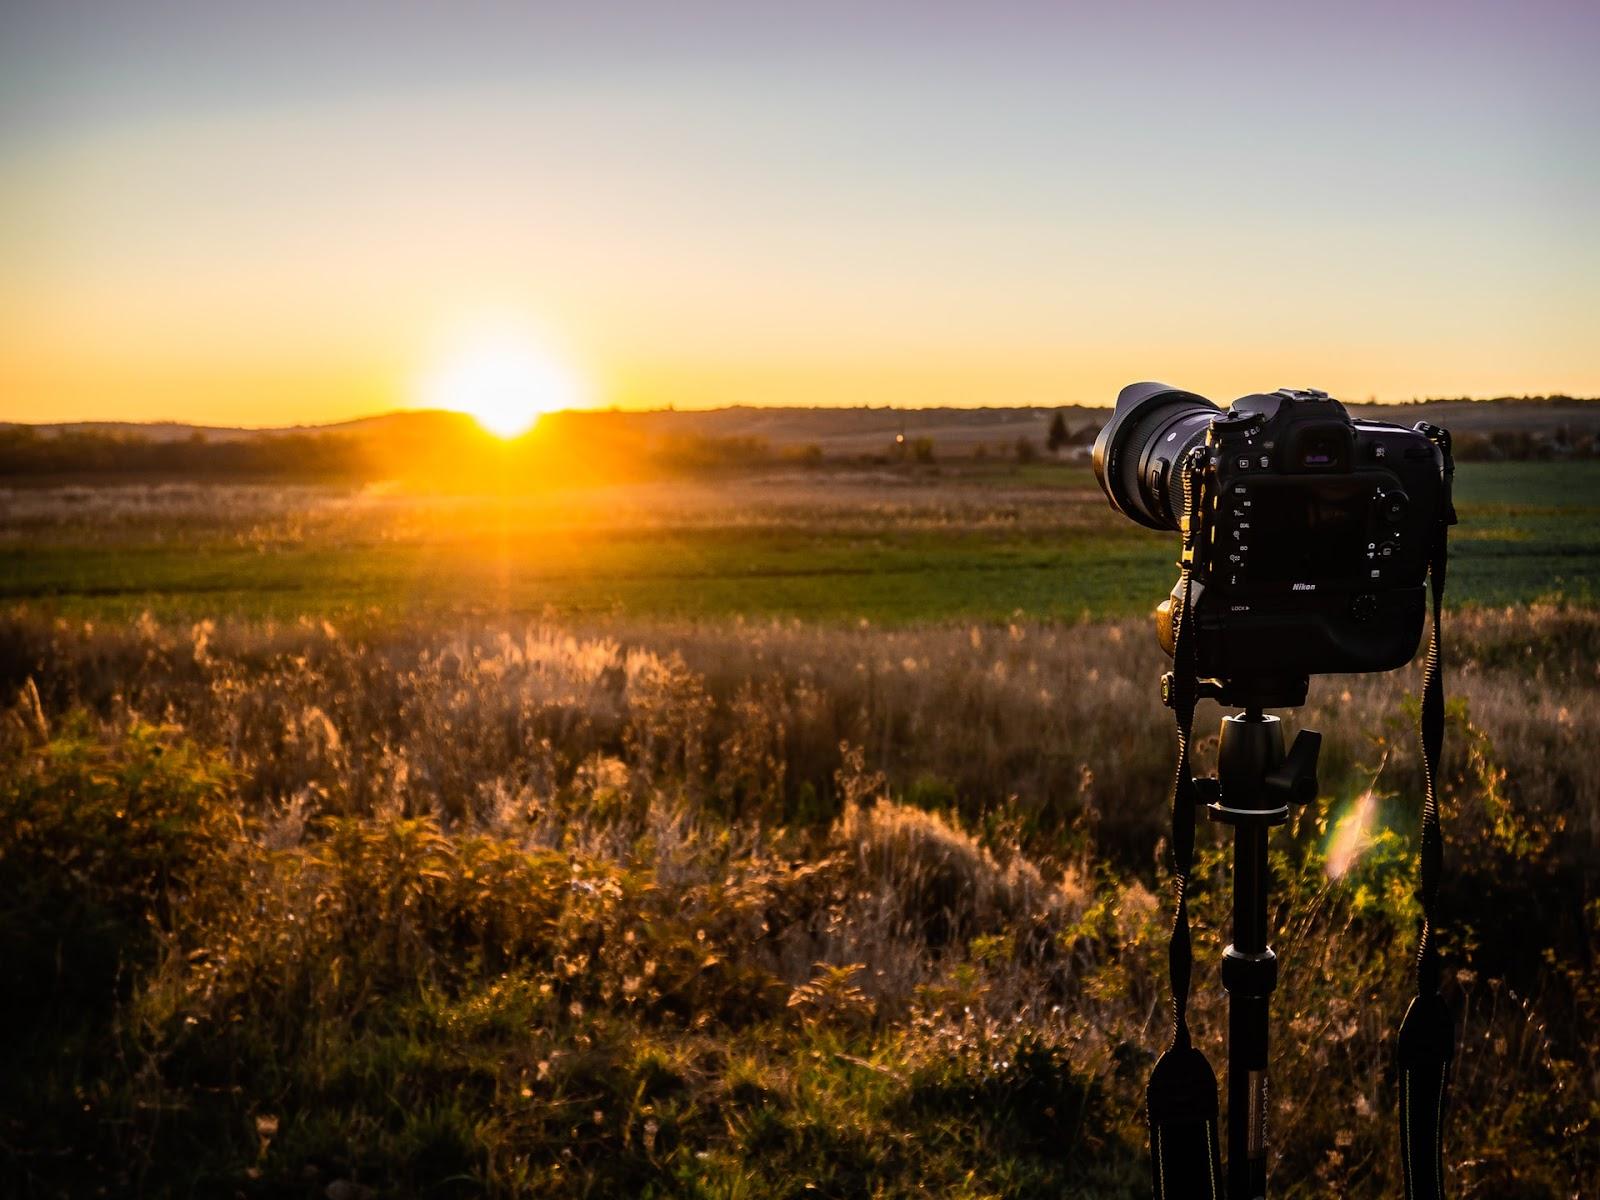 lens hood on a camera shooting into the sun